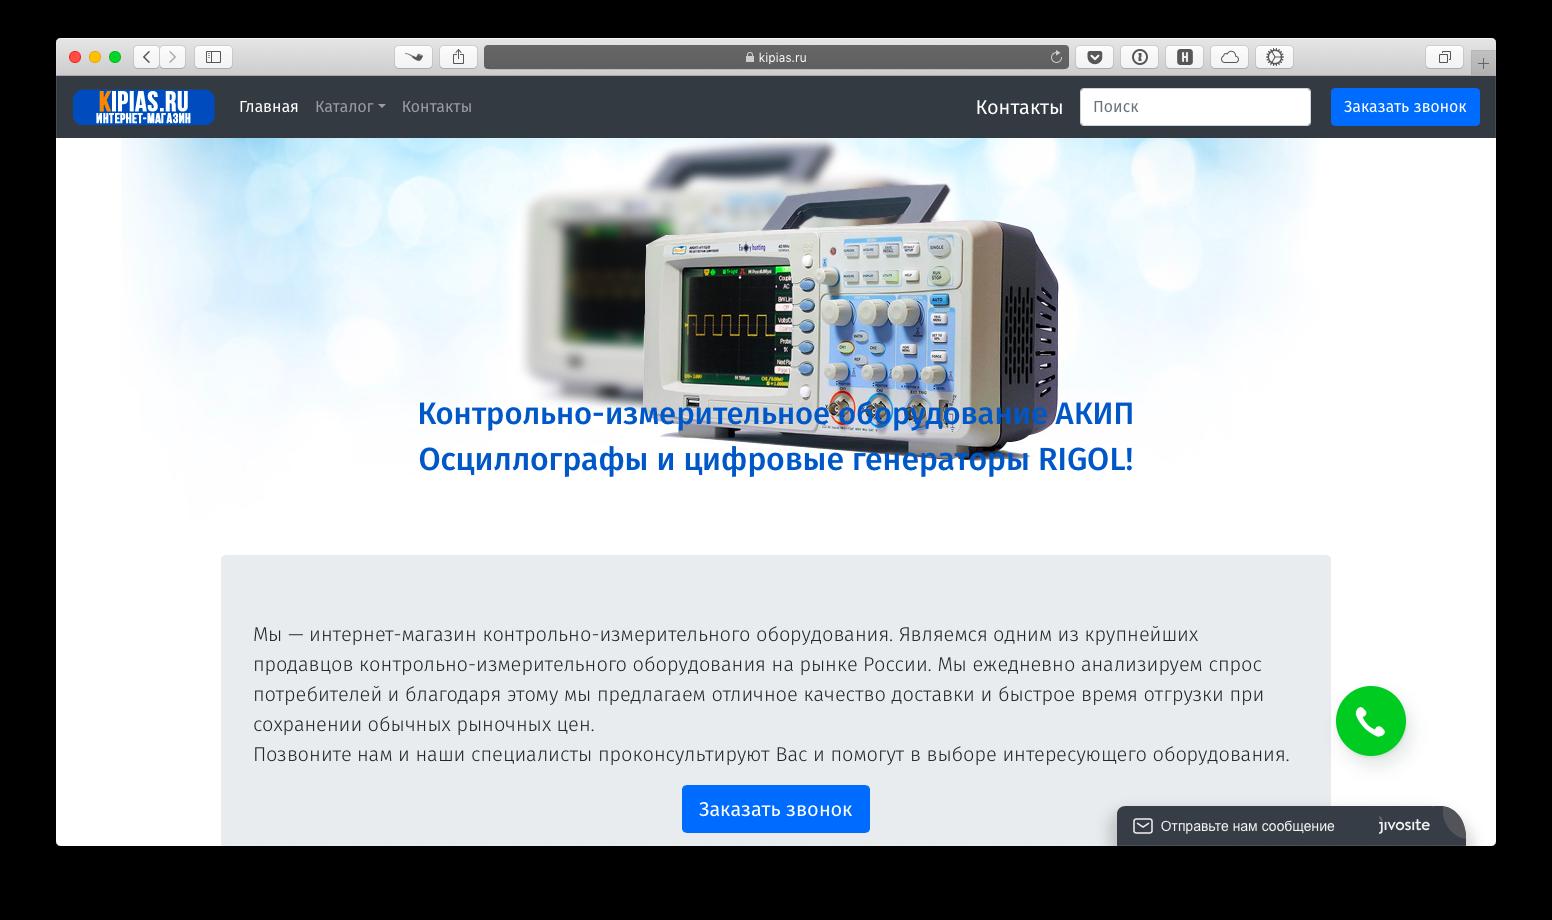 Интернет-магазин kipias.ru